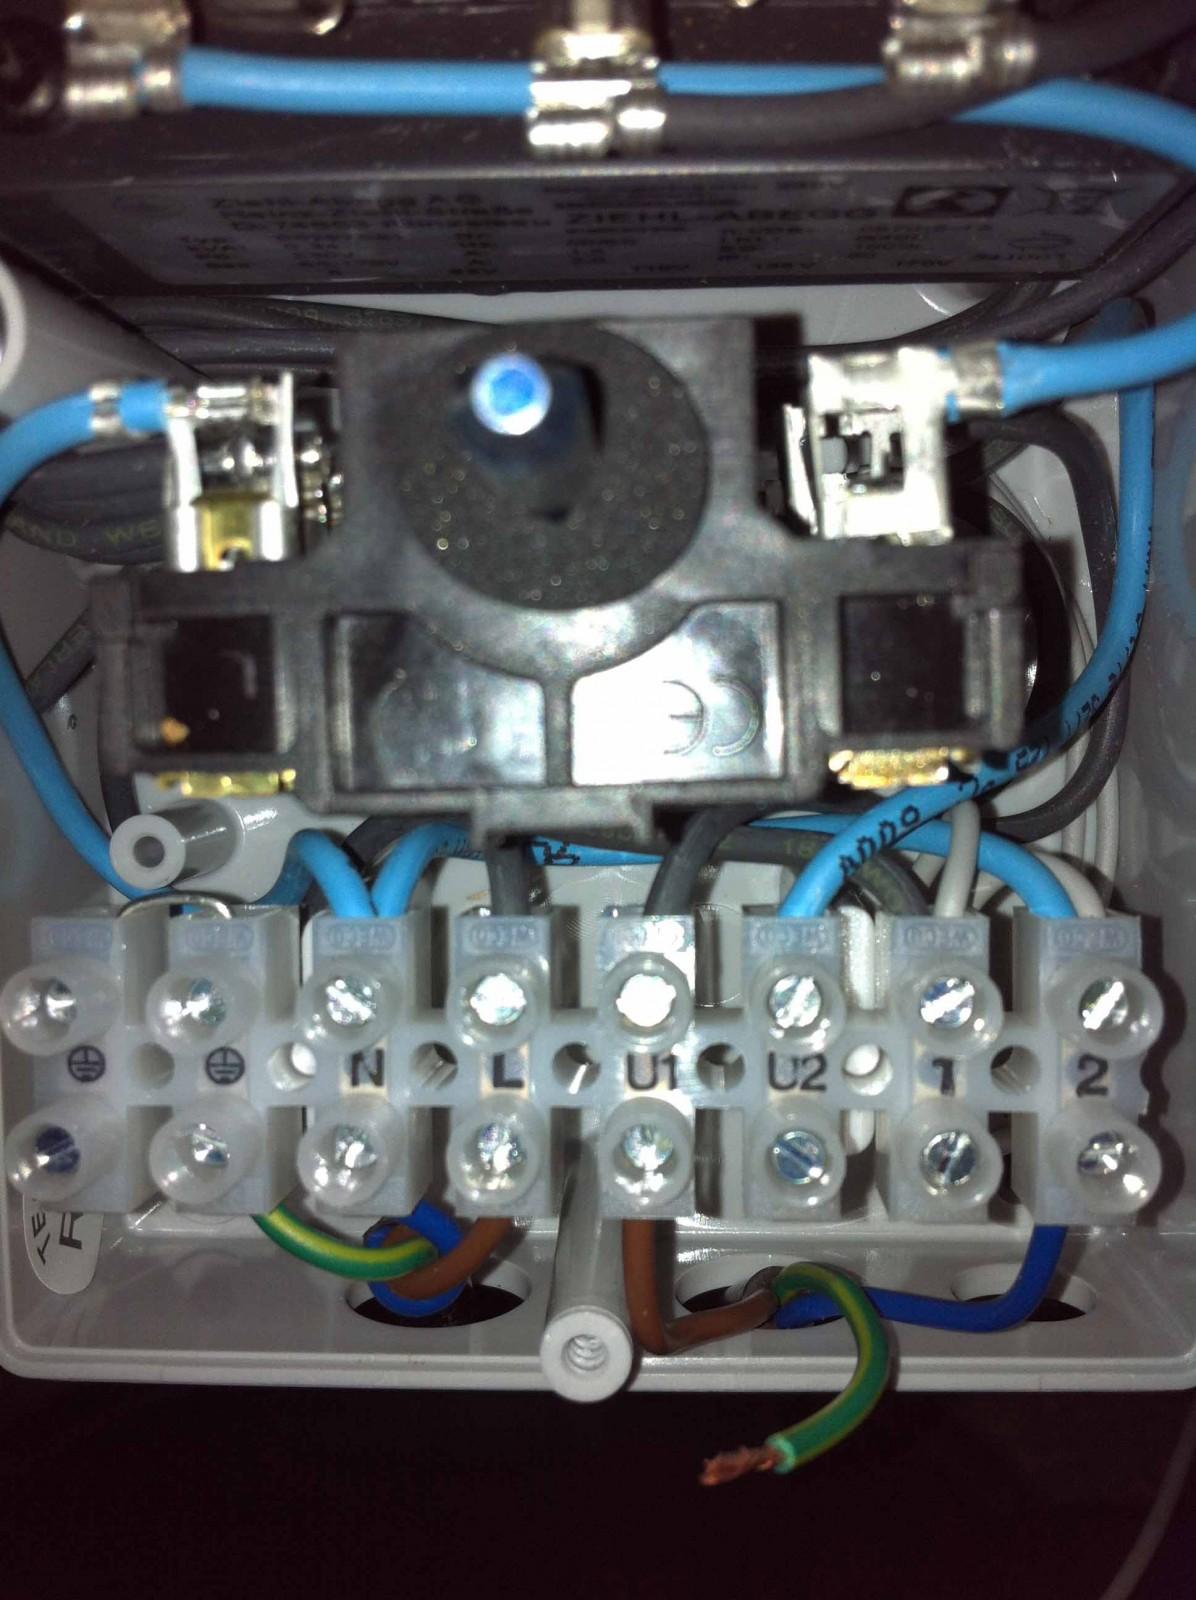 [DIAGRAM_38DE]  Help Wiring a Ziehl-Abegg STR Voltage Controller - Environment - UK420 | Ziehl Abegg Motor Wiring Diagram |  | UK420